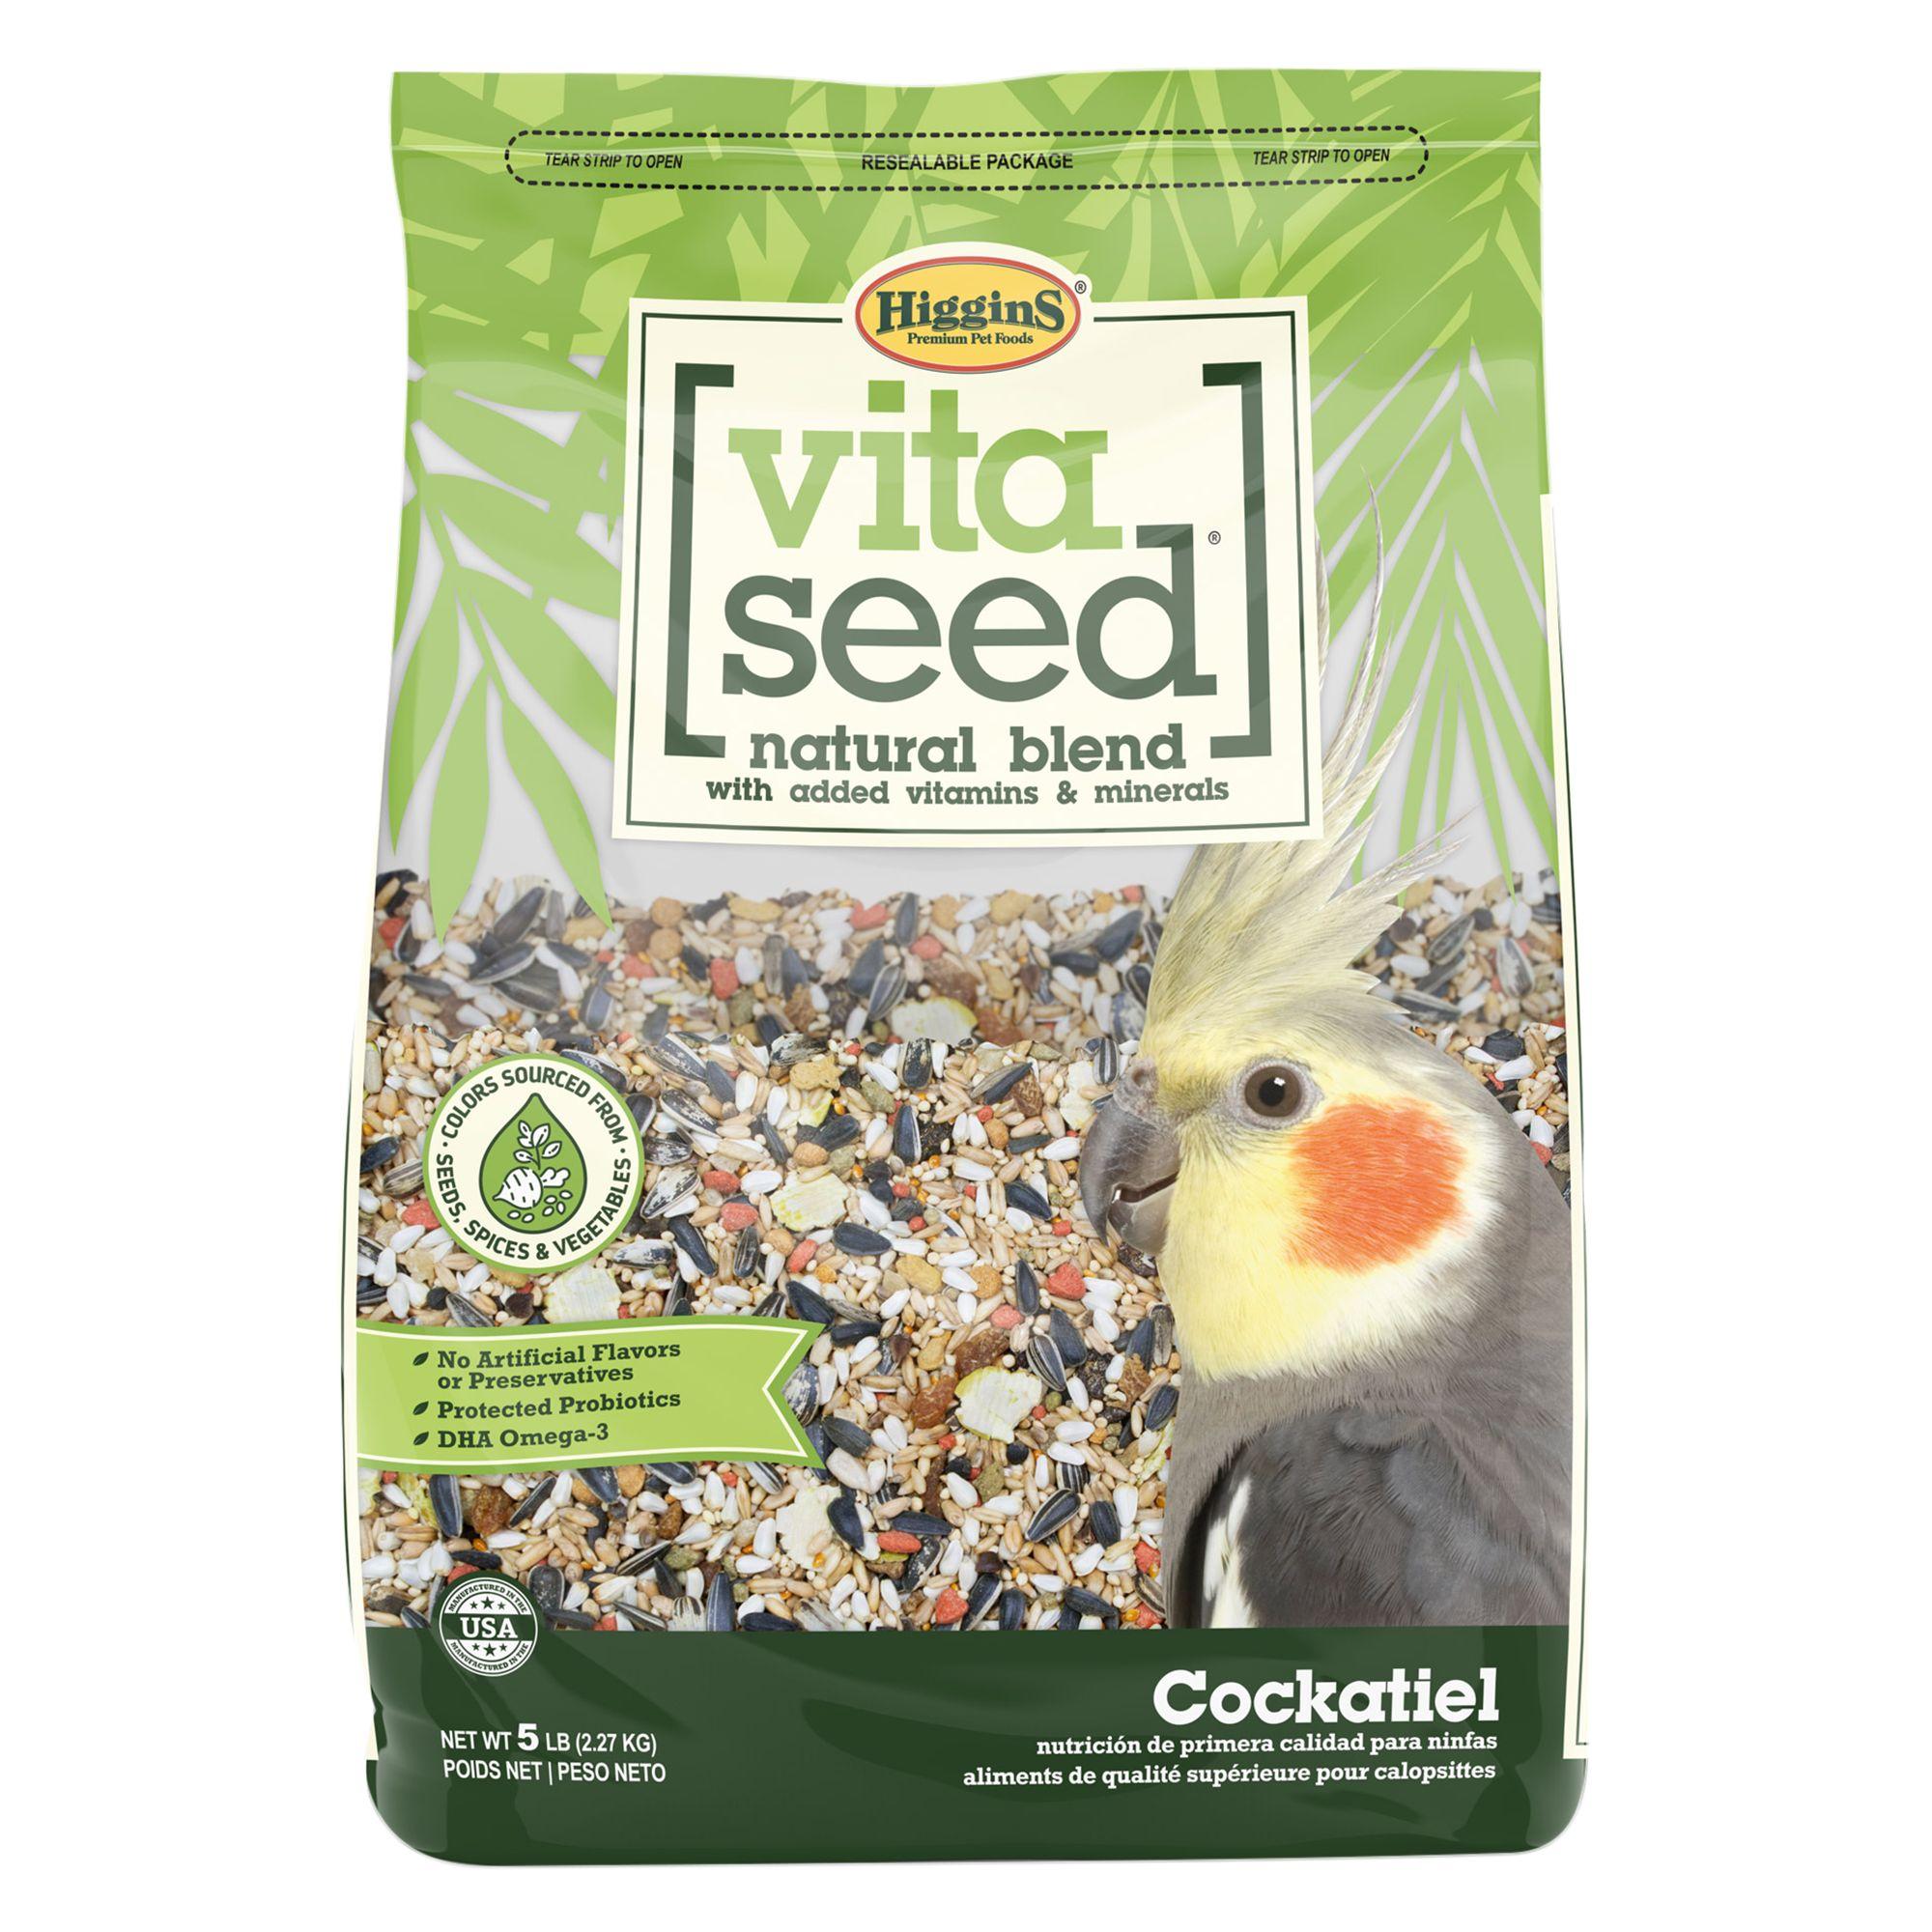 Higgins Vita Seed Cockatiel Food size: 5 Lb 5262916